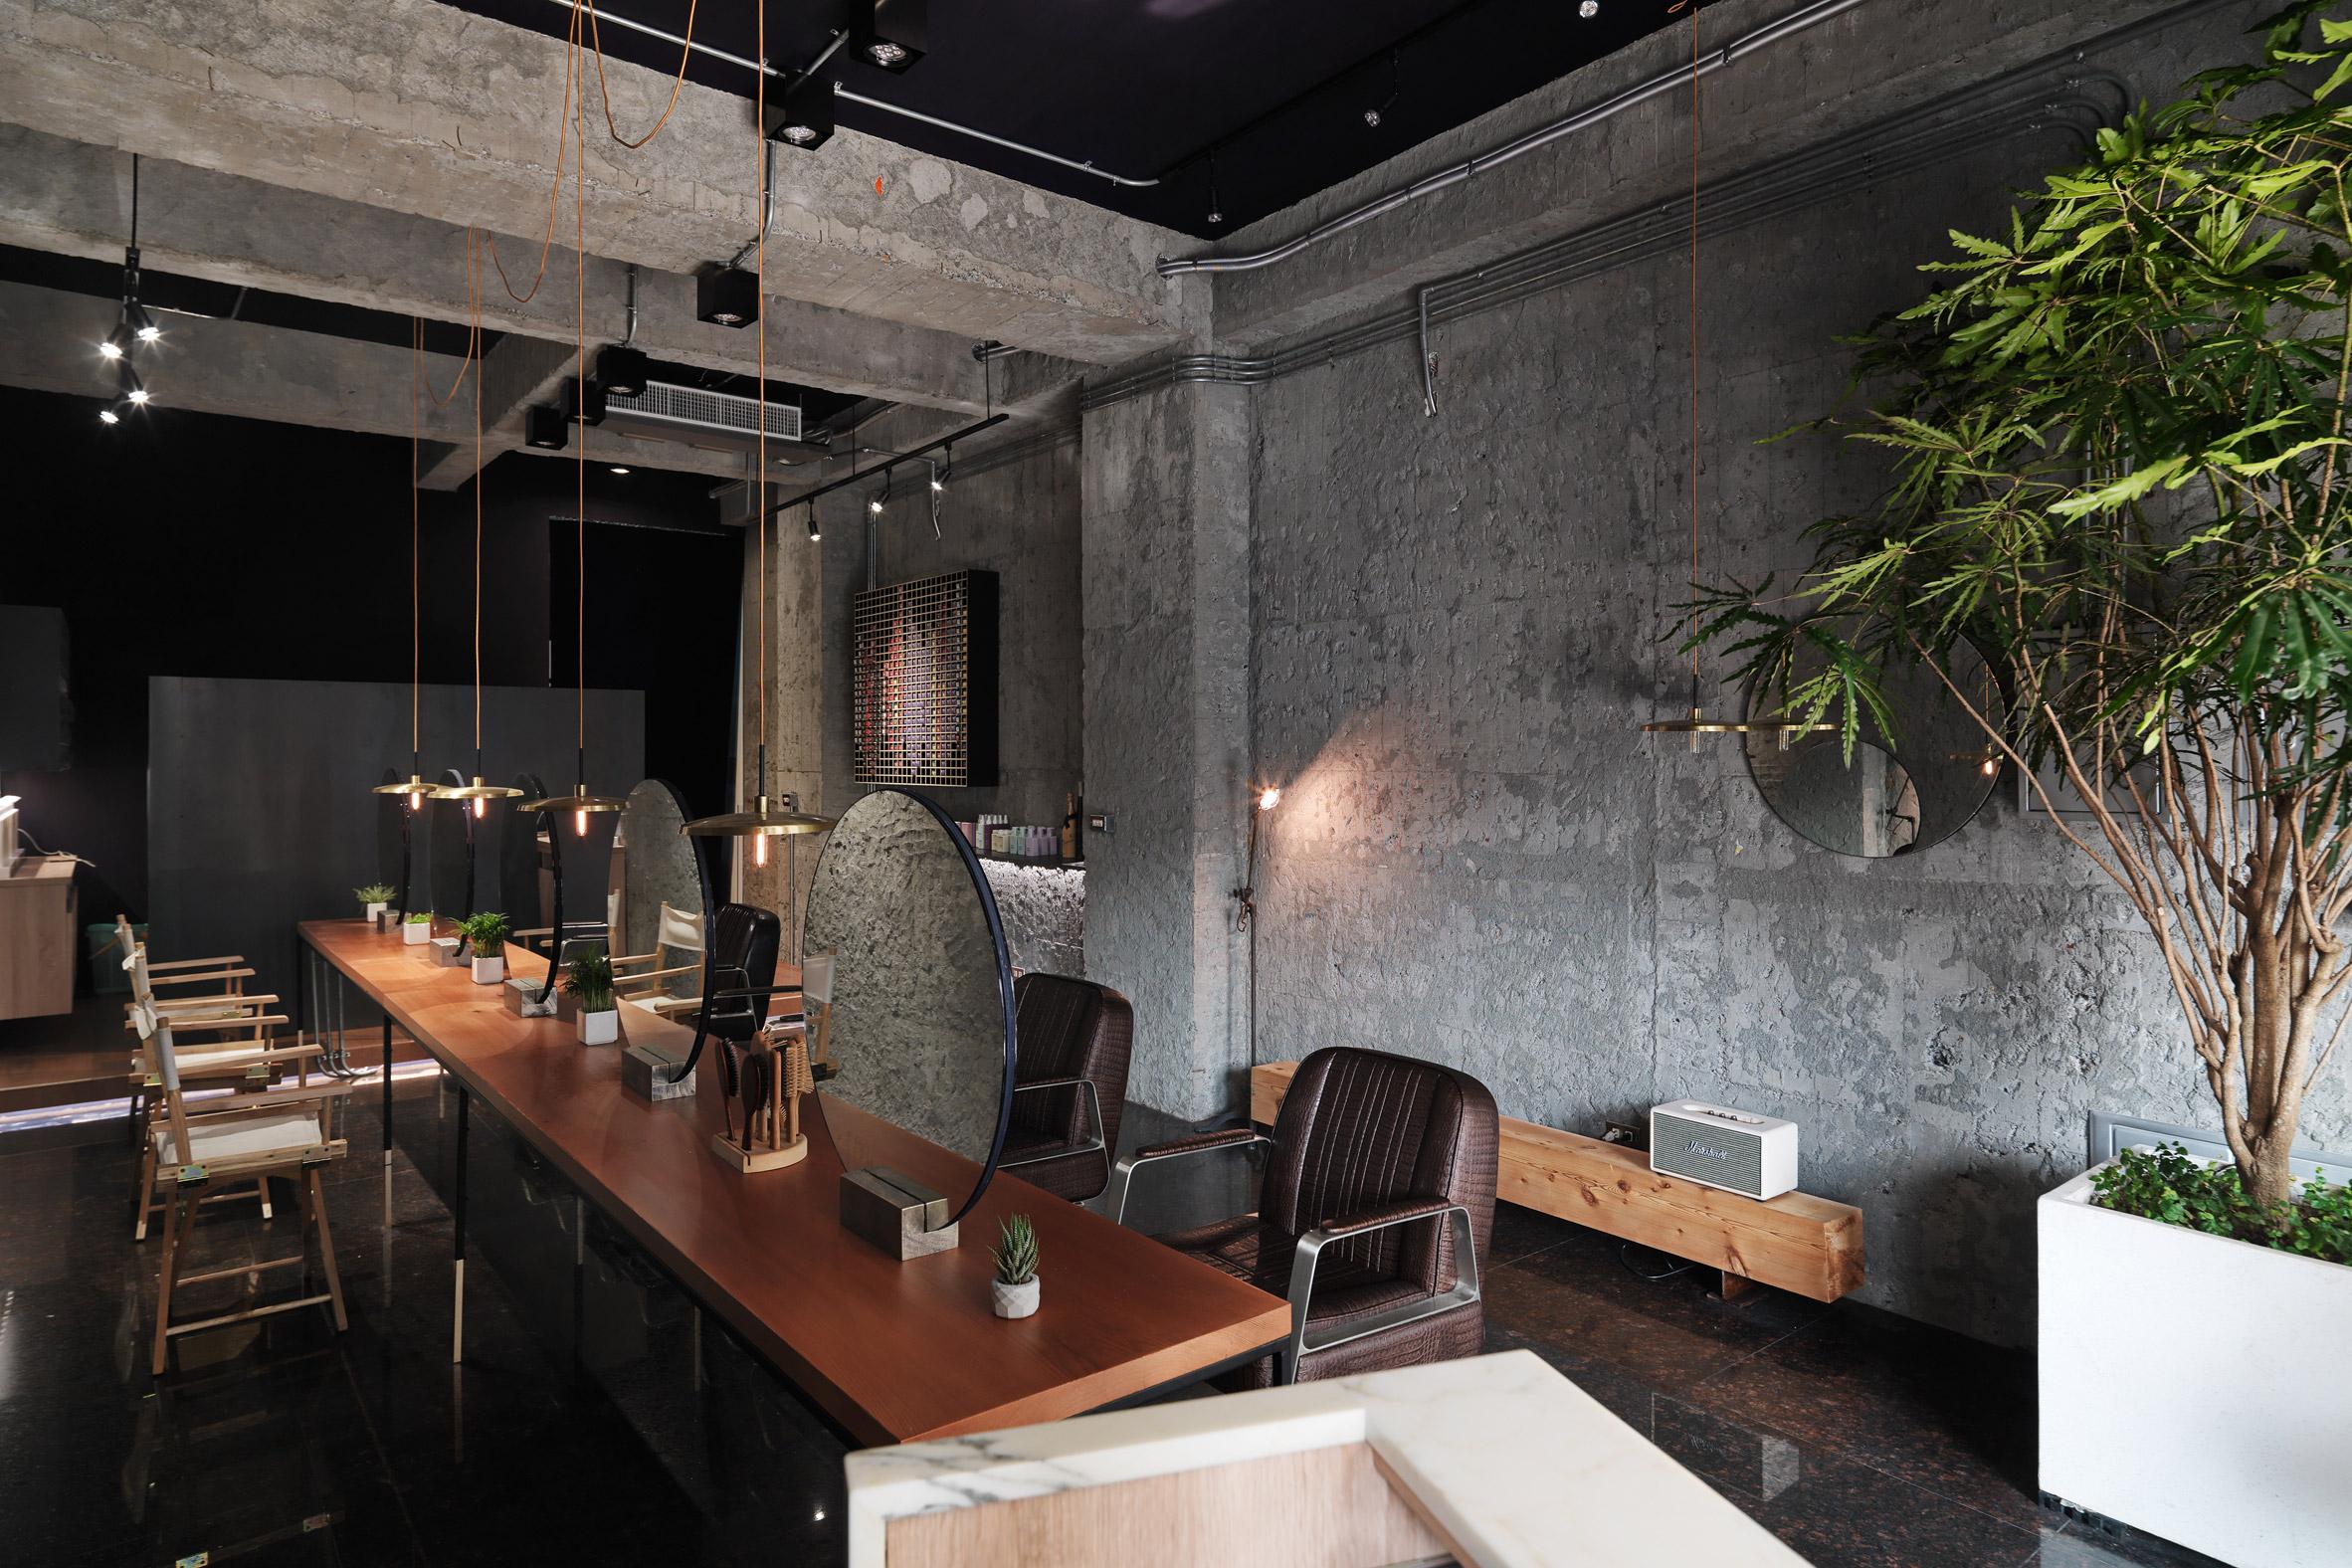 luna-salon-soar-design-interiors-changhua-taiwan_dezeen_2364_col_11